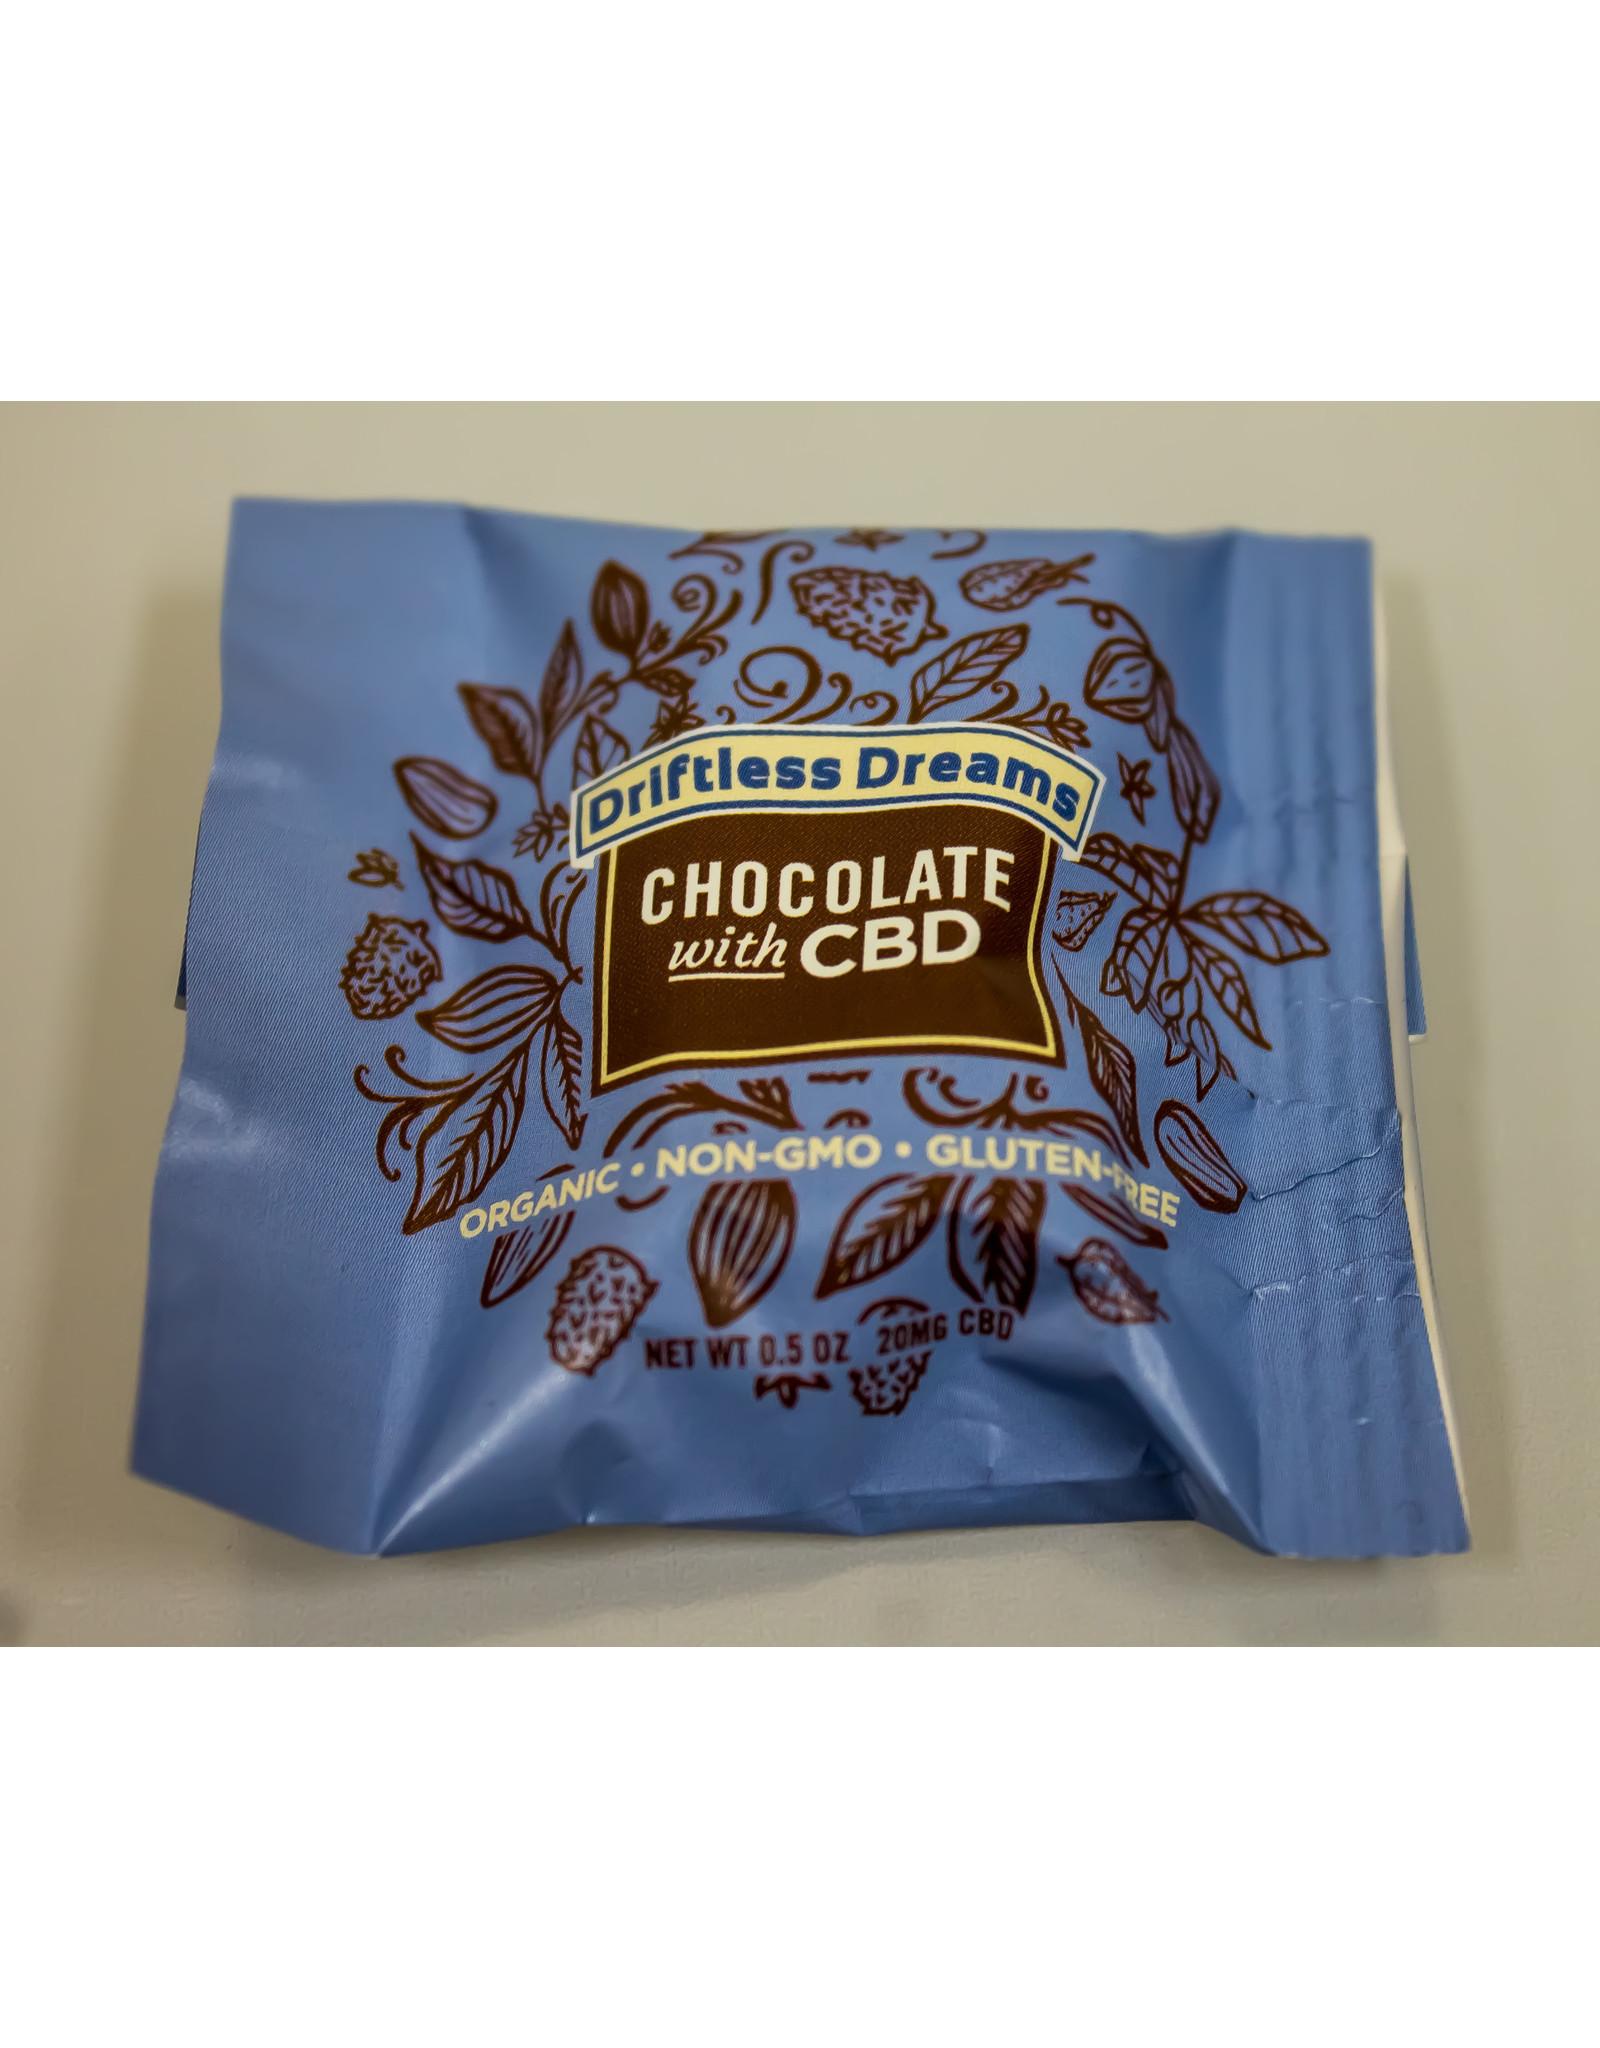 Driftless Dreams Driftless Dreams 20mg CBD Chocolate